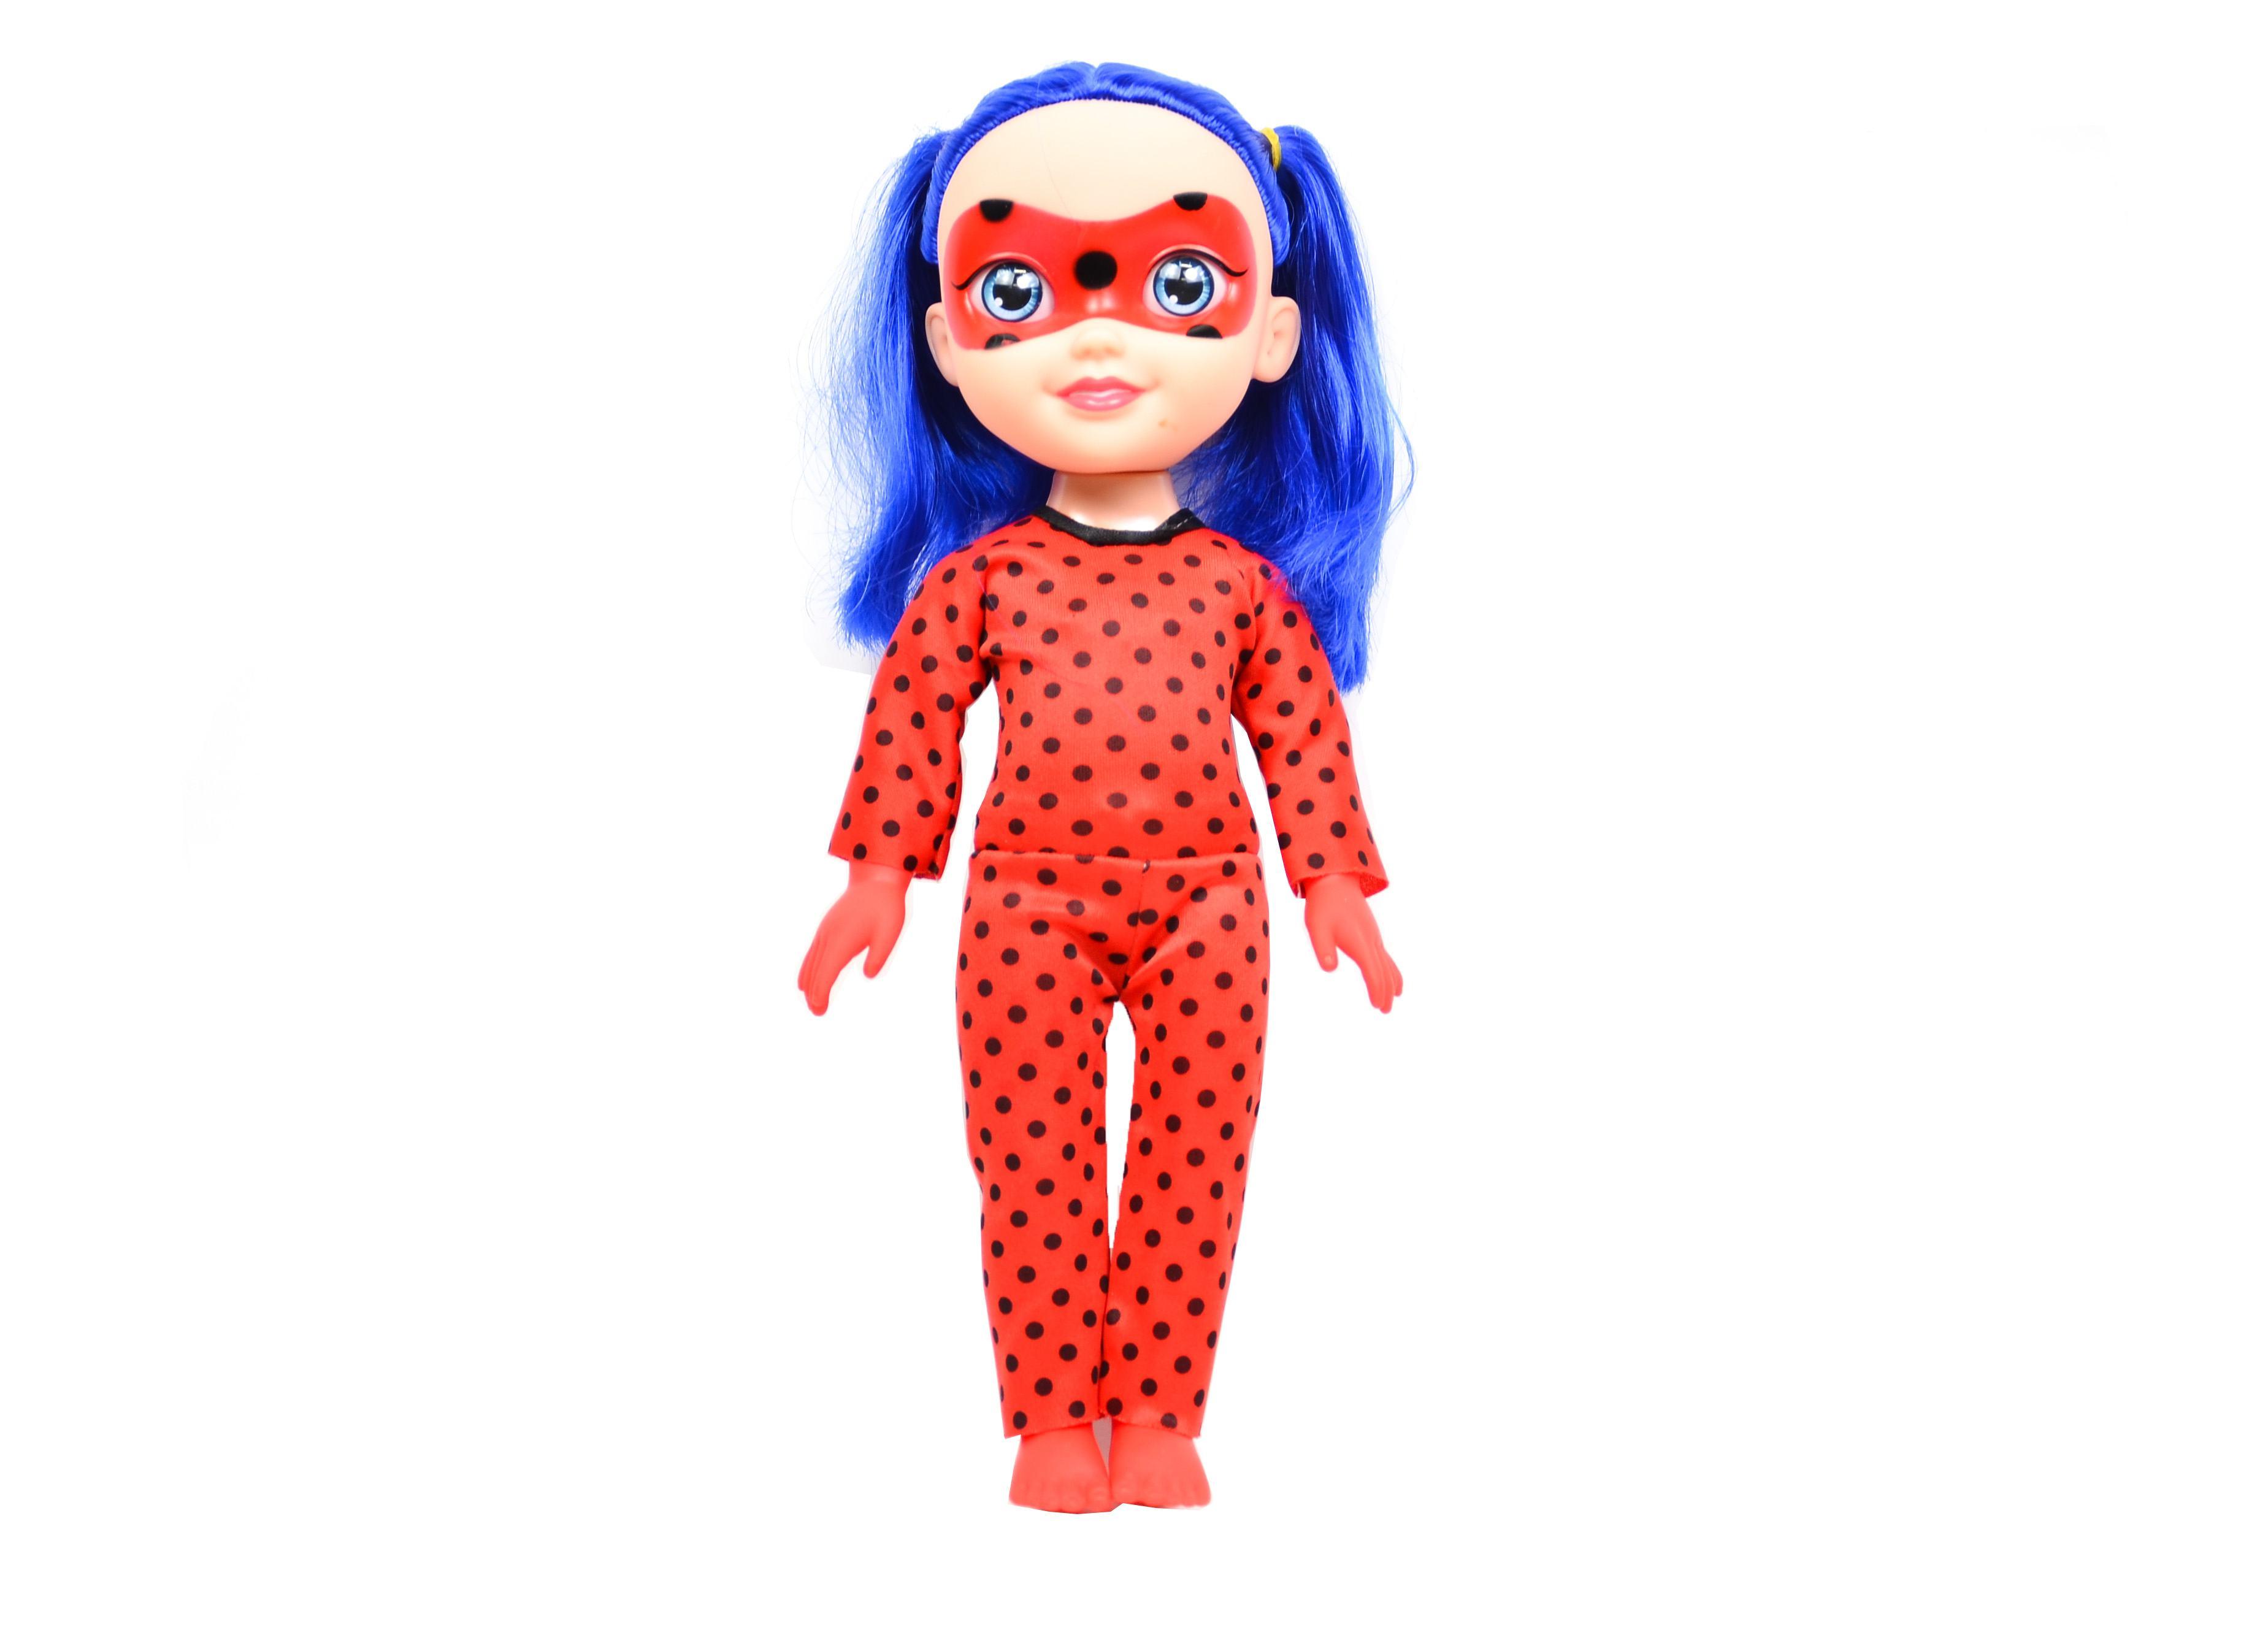 Papusa Miraculos Buburuza de jucarie pentru fetite - 35 cm - PM871